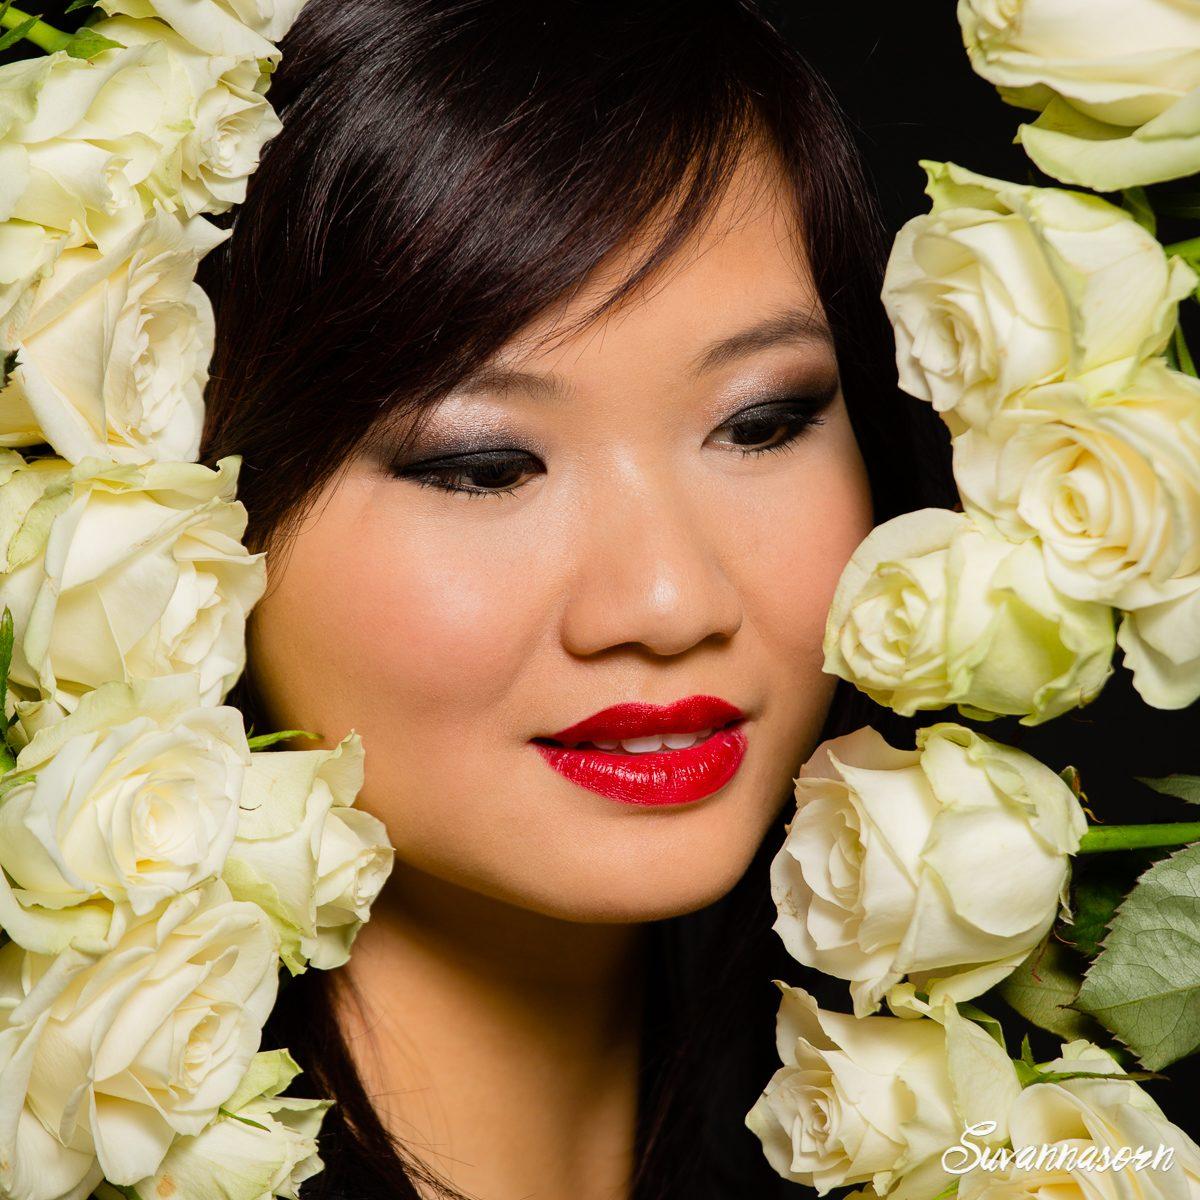 suvannasorn maquillage smoky eyes beauté femme genève maquilleuse artiste photographe